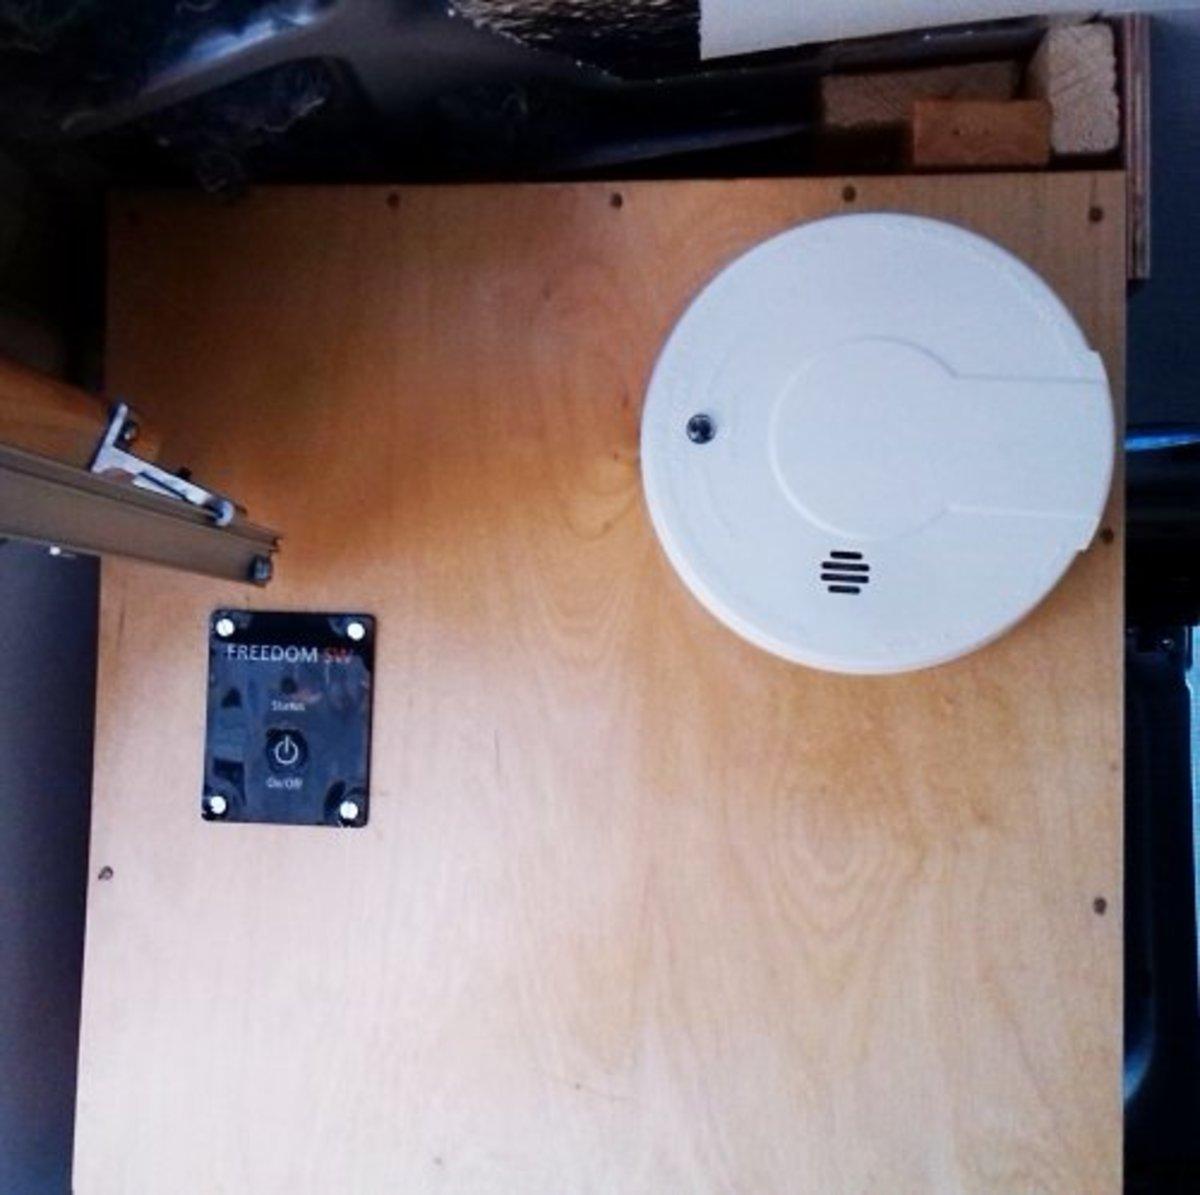 Inverter Remote and Smoke Detector